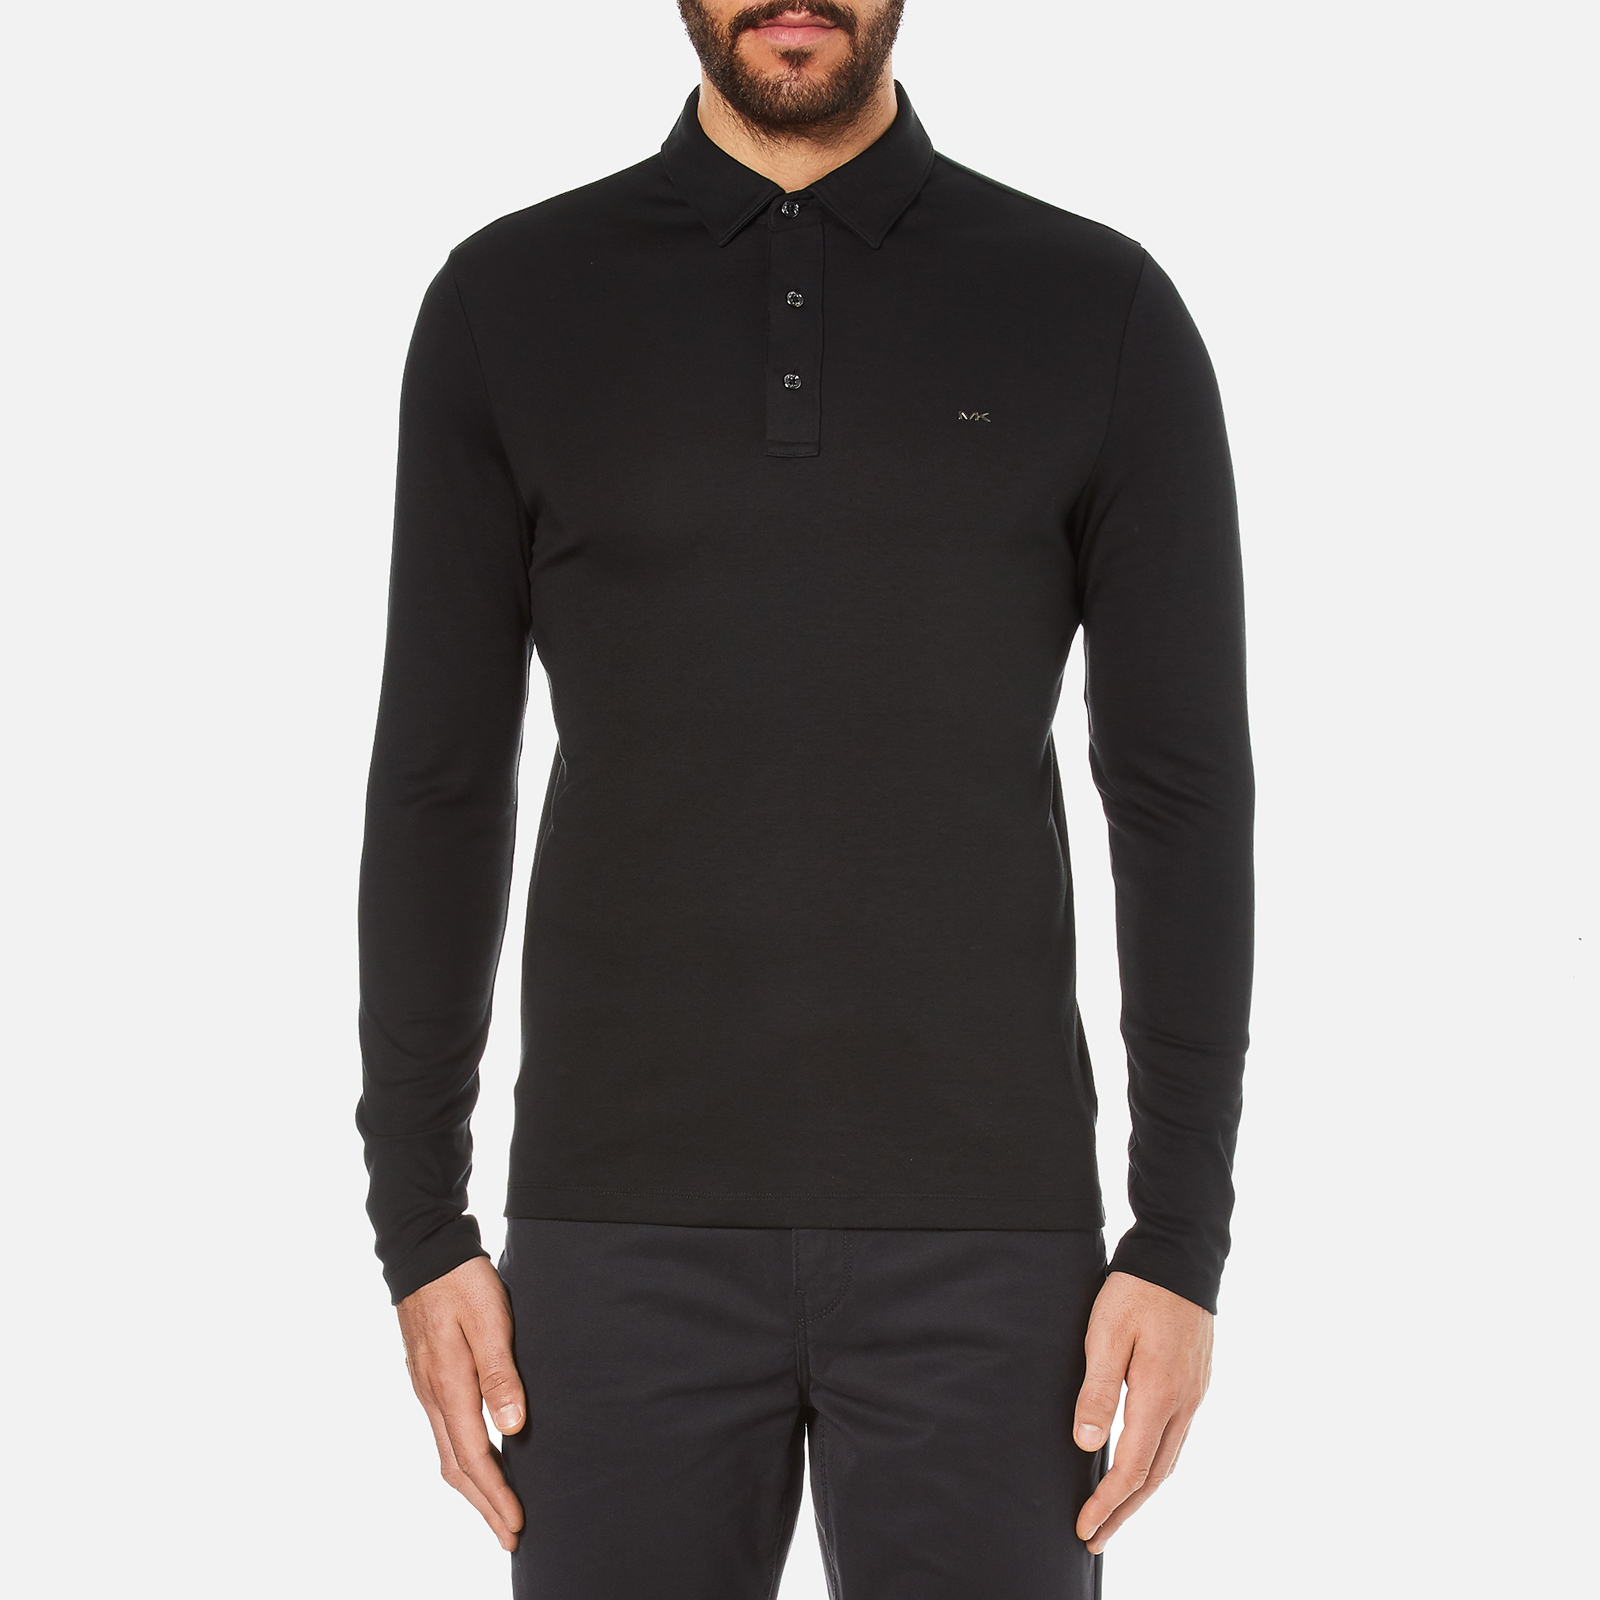 de82dfbfd Michael Kors Men's Long Sleeve Sleek MK Polo Top - Black - Free UK Delivery  over £50